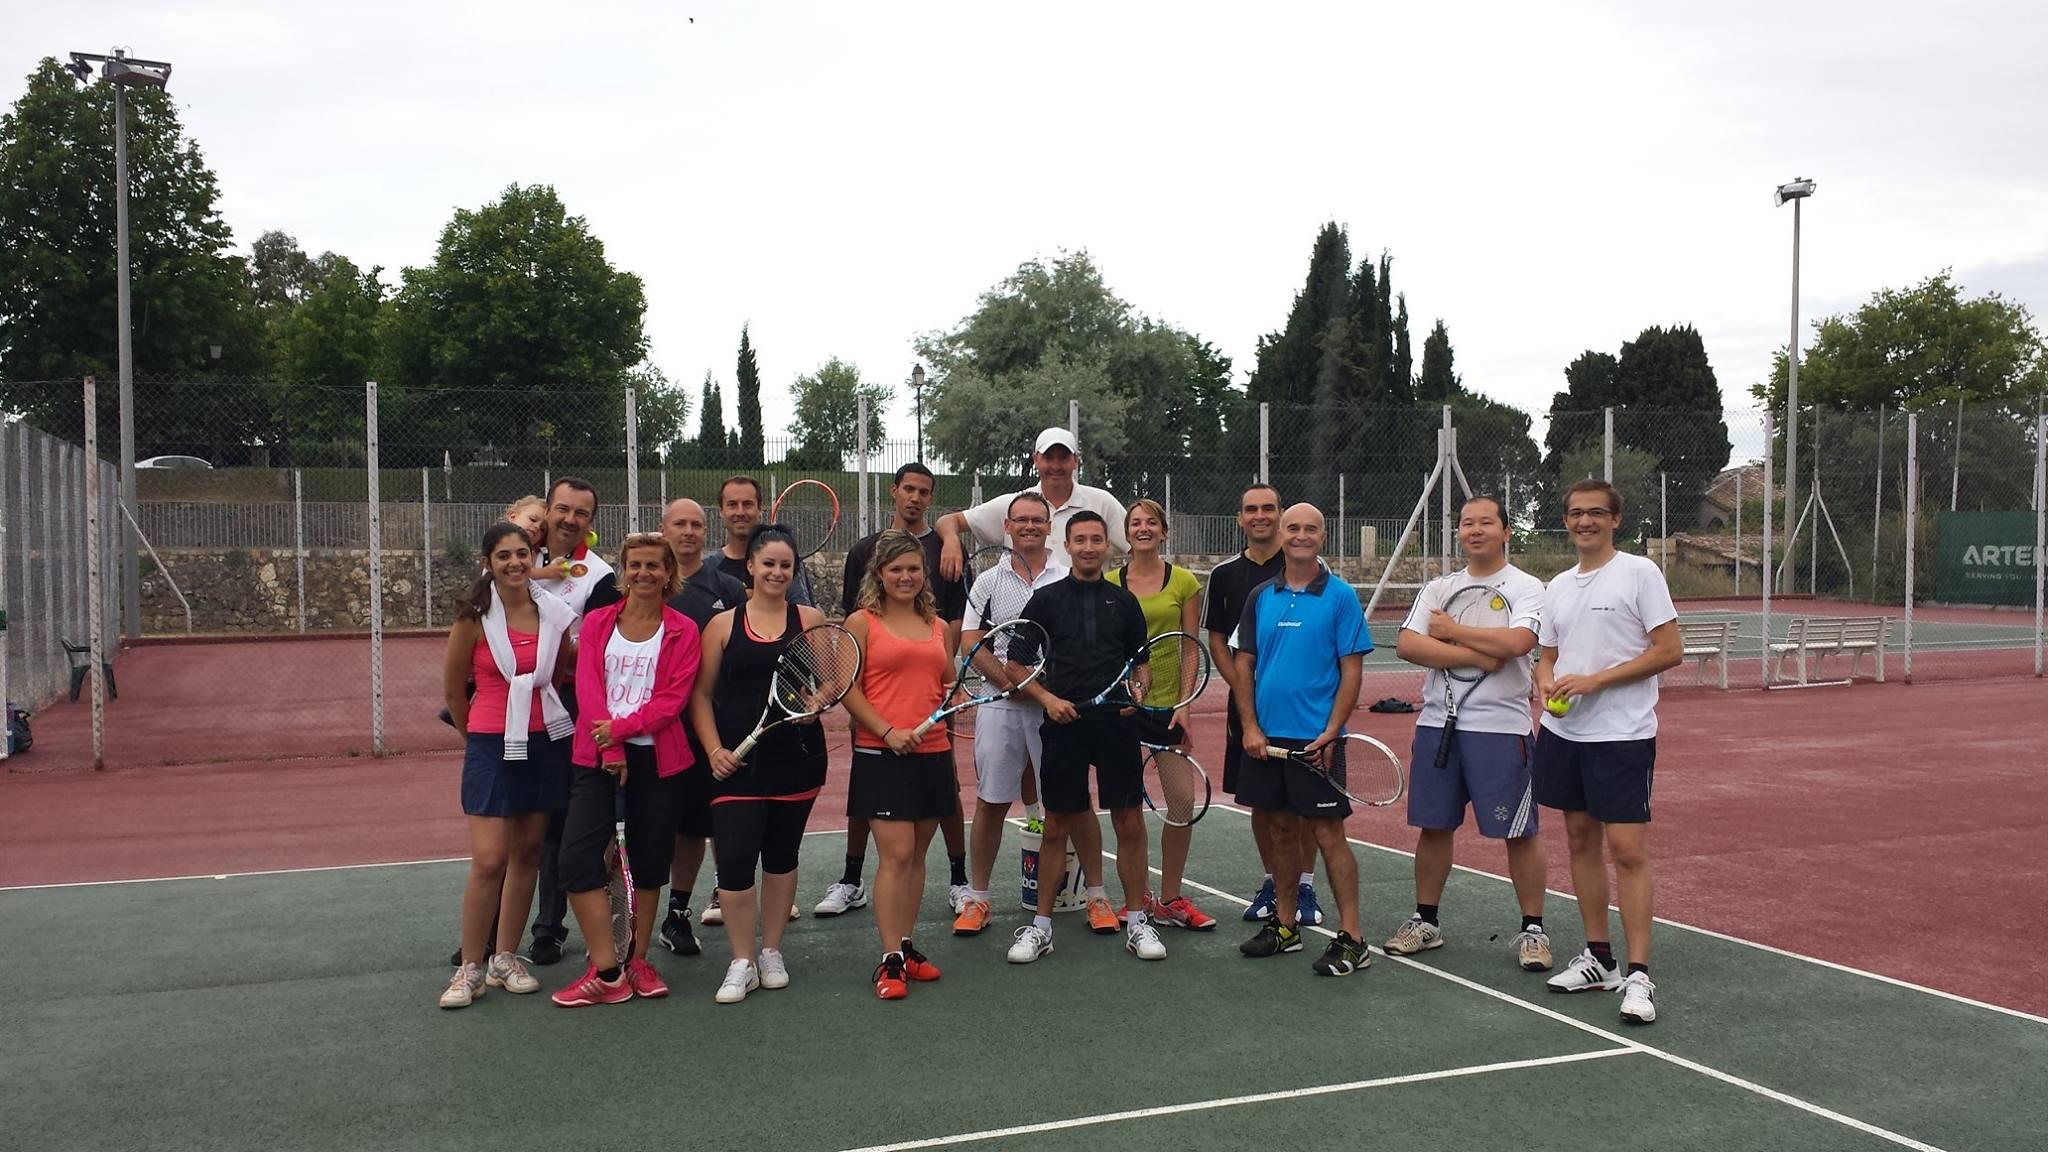 Club de tennis municipal chateauneuf grasse 06 tennis for Club de tennis interieur saguenay